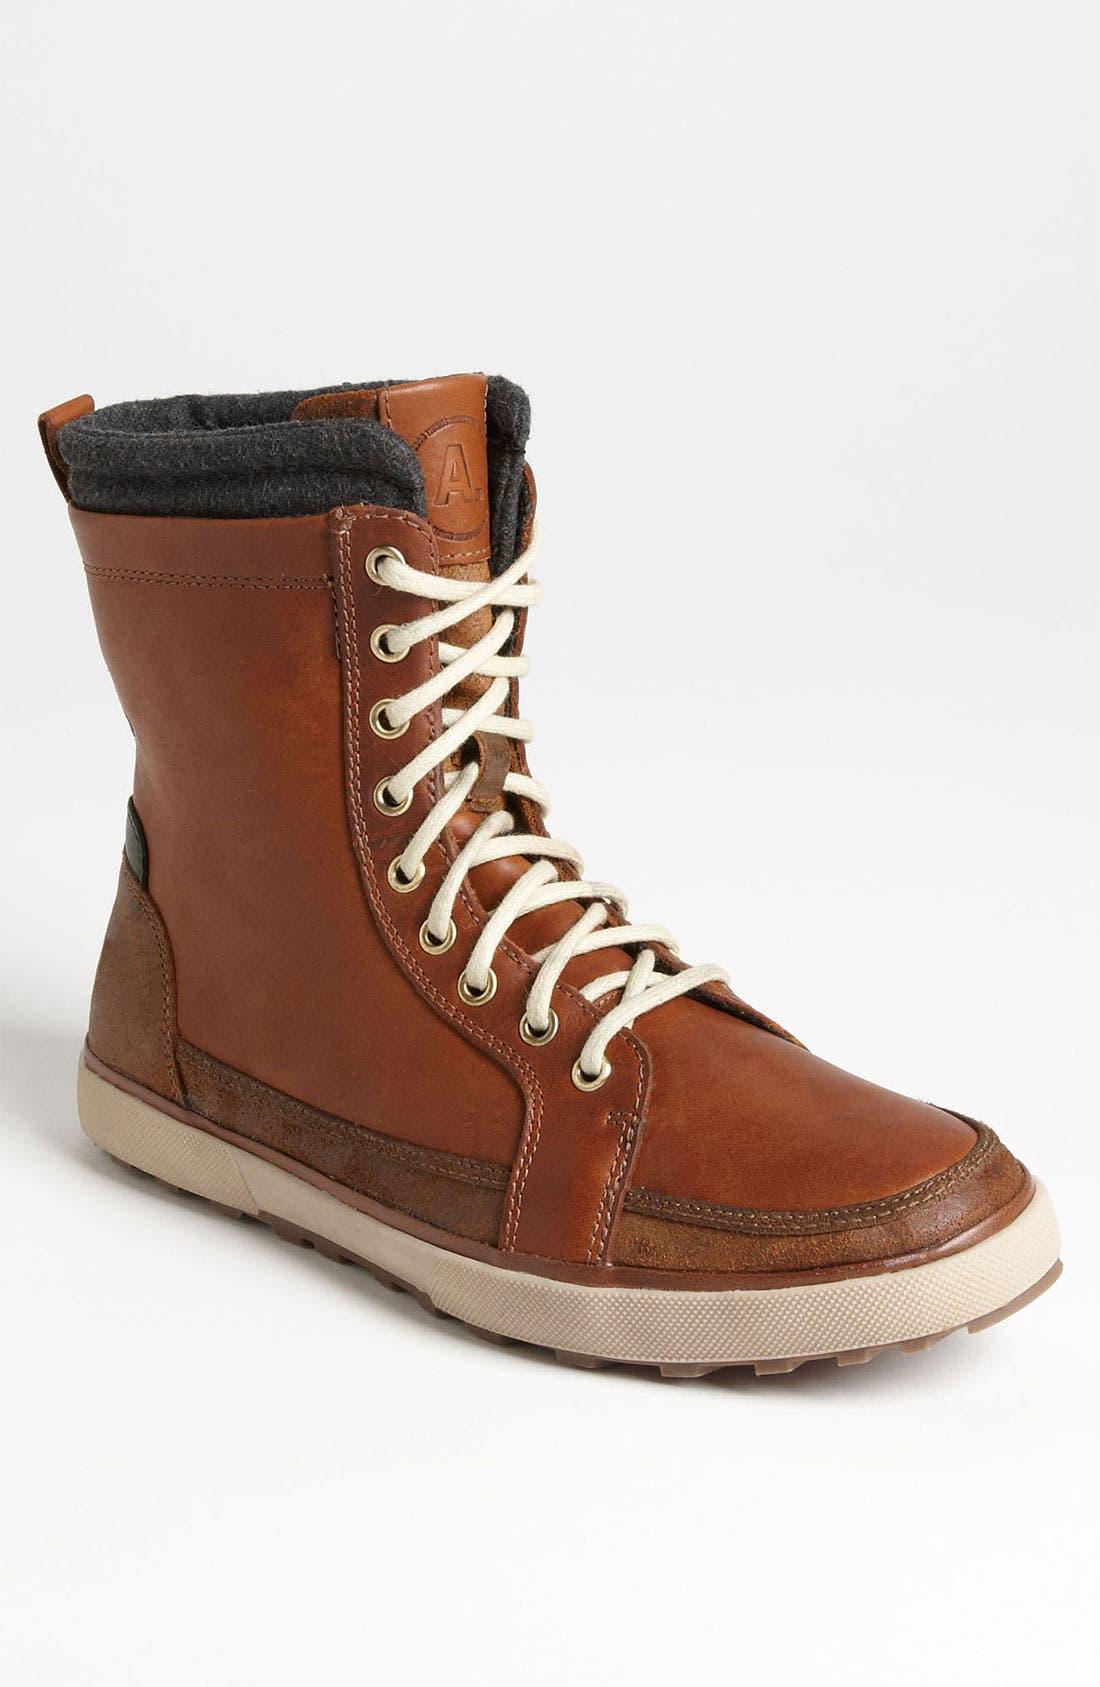 Main Image - ALDO 'Grabau' Moc Toe Boot